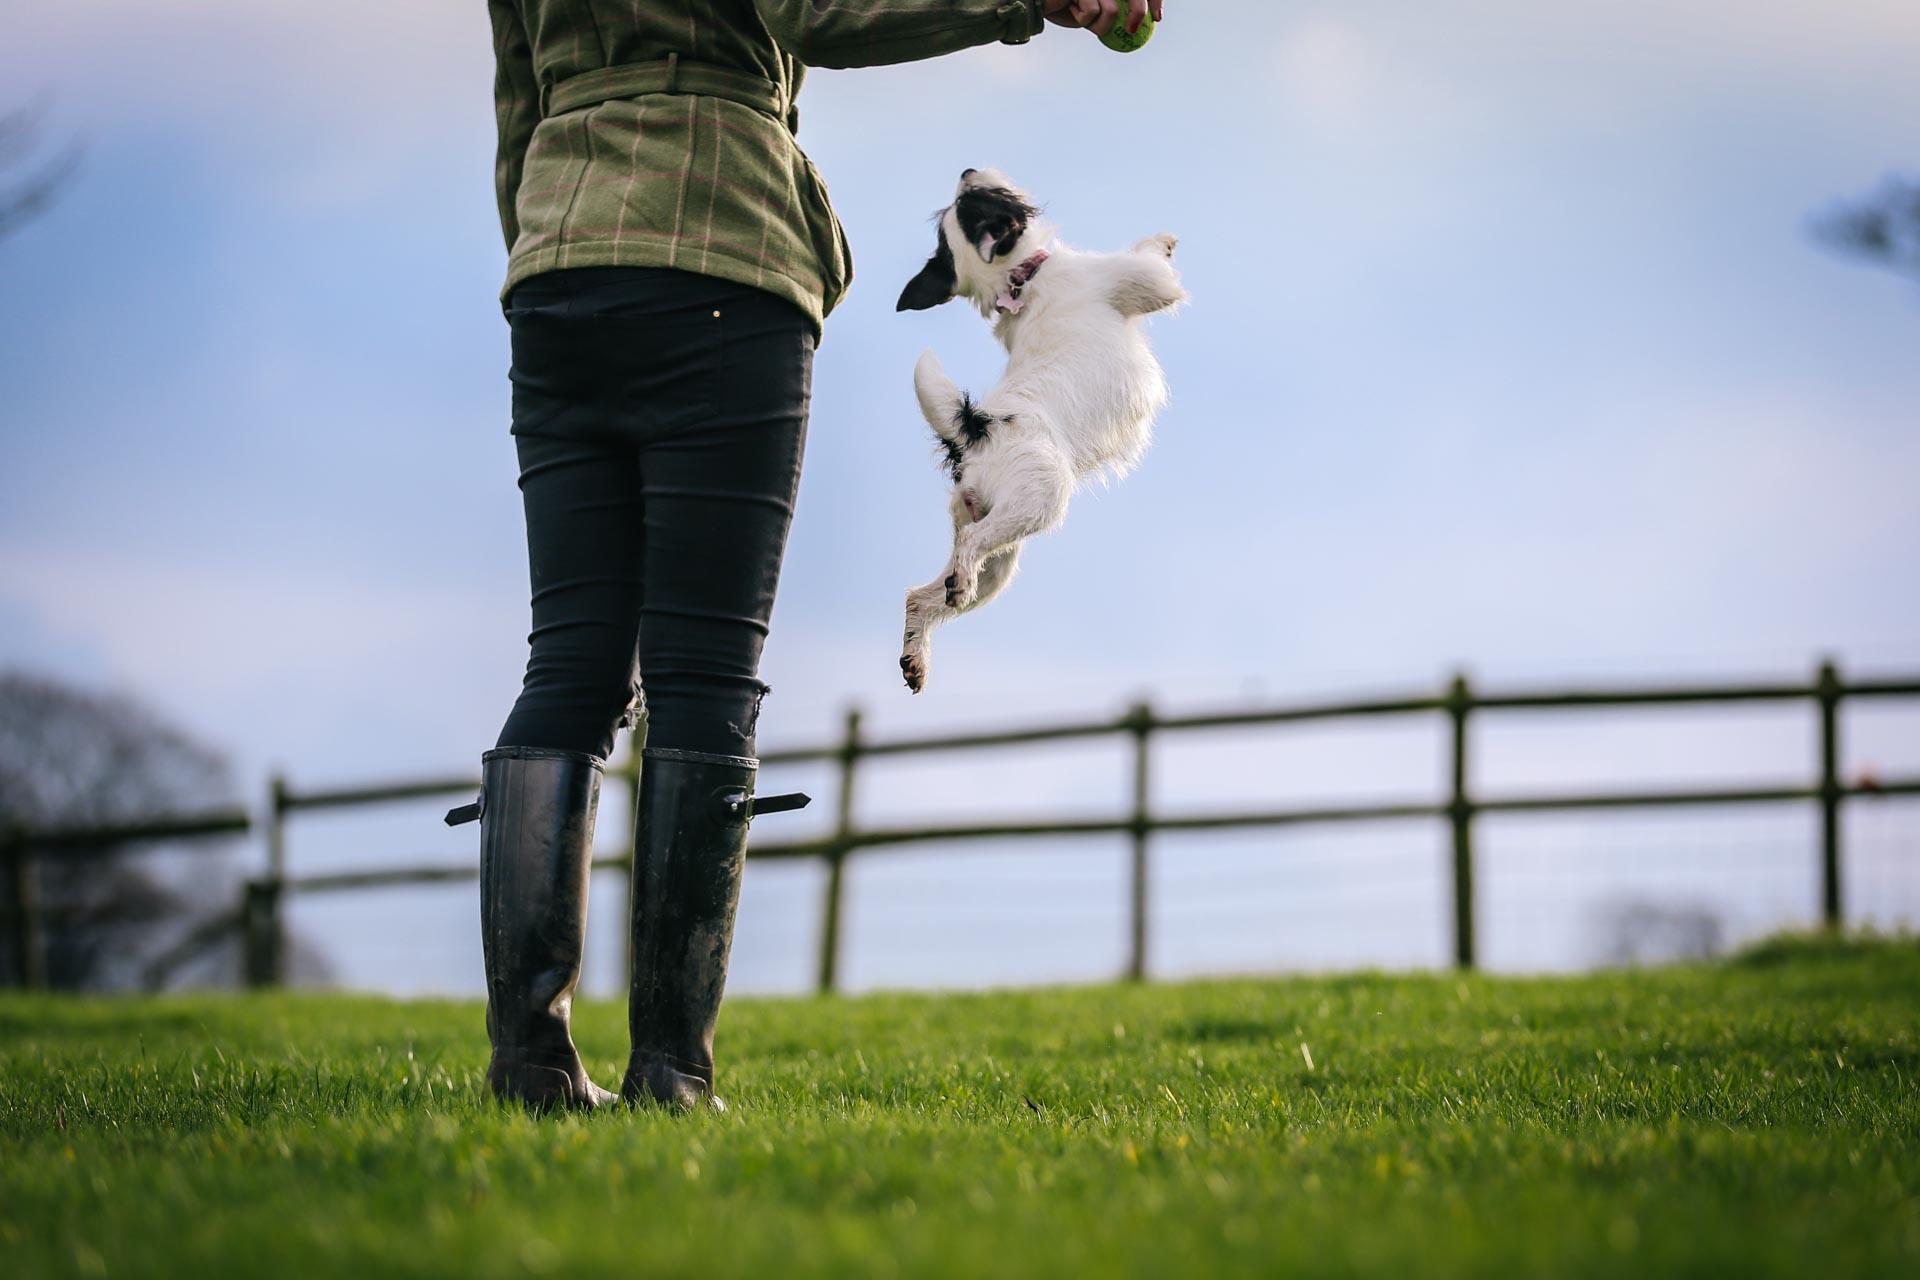 Jack Russell Pet Portrait Joanna Eardley Photography